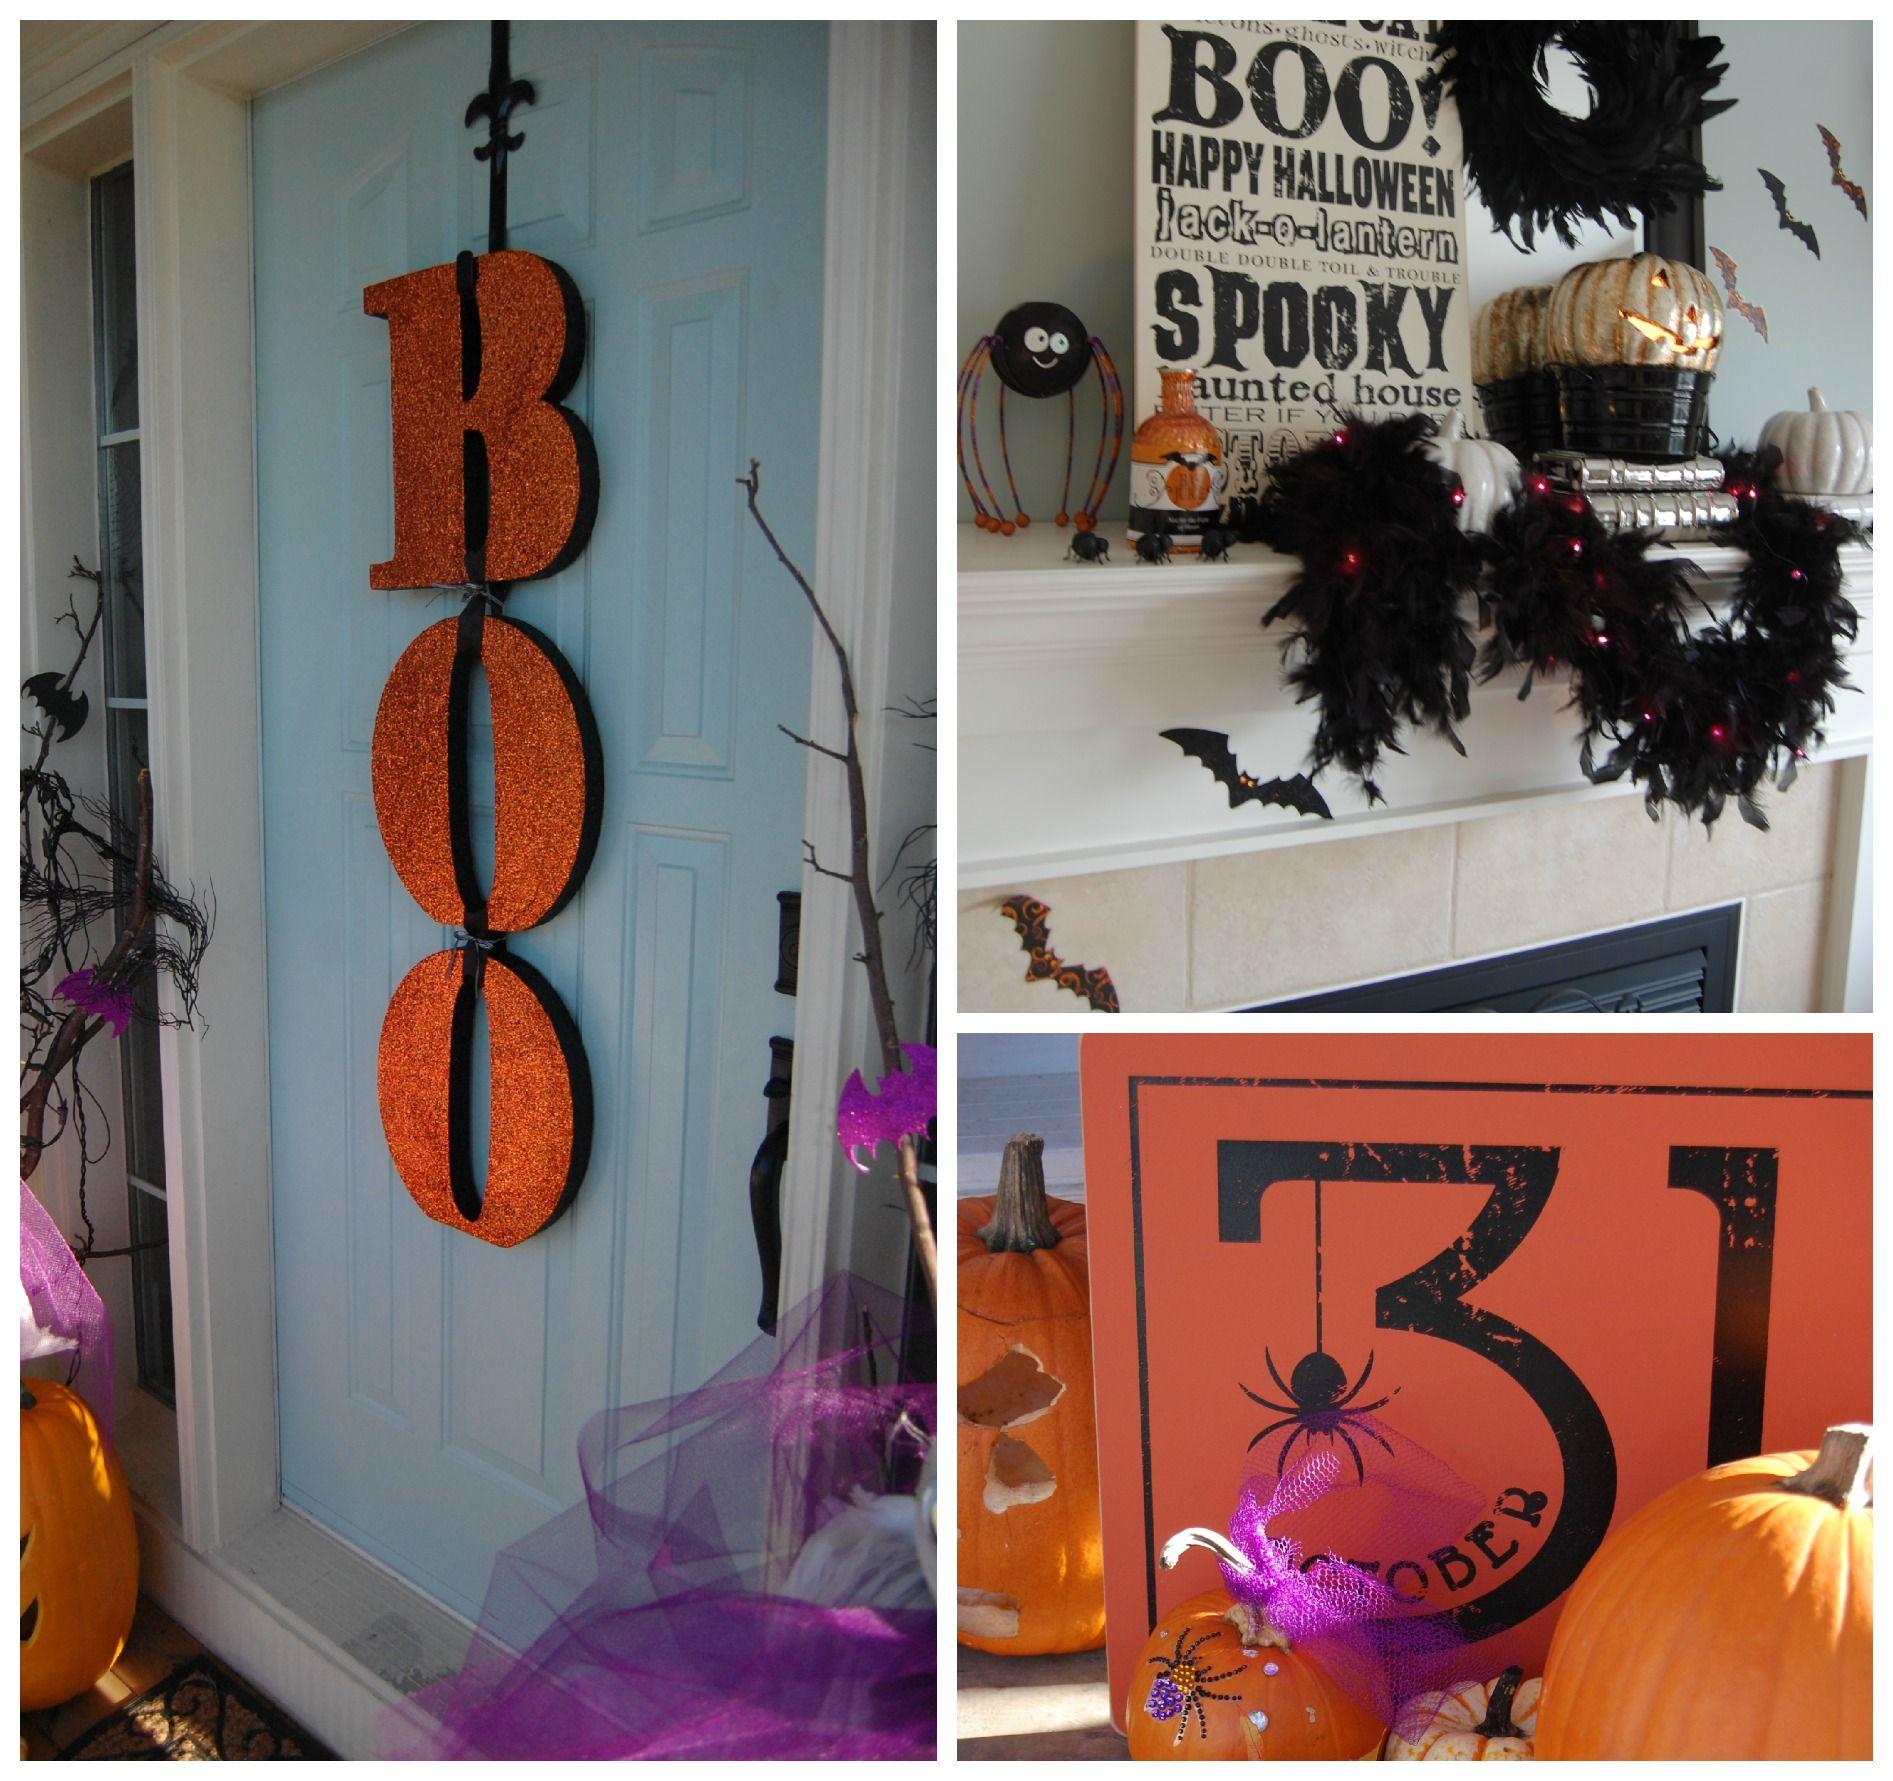 Kid-Friendly Halloween Decorating Ideas Decorating, Holidays and - fun halloween decorations